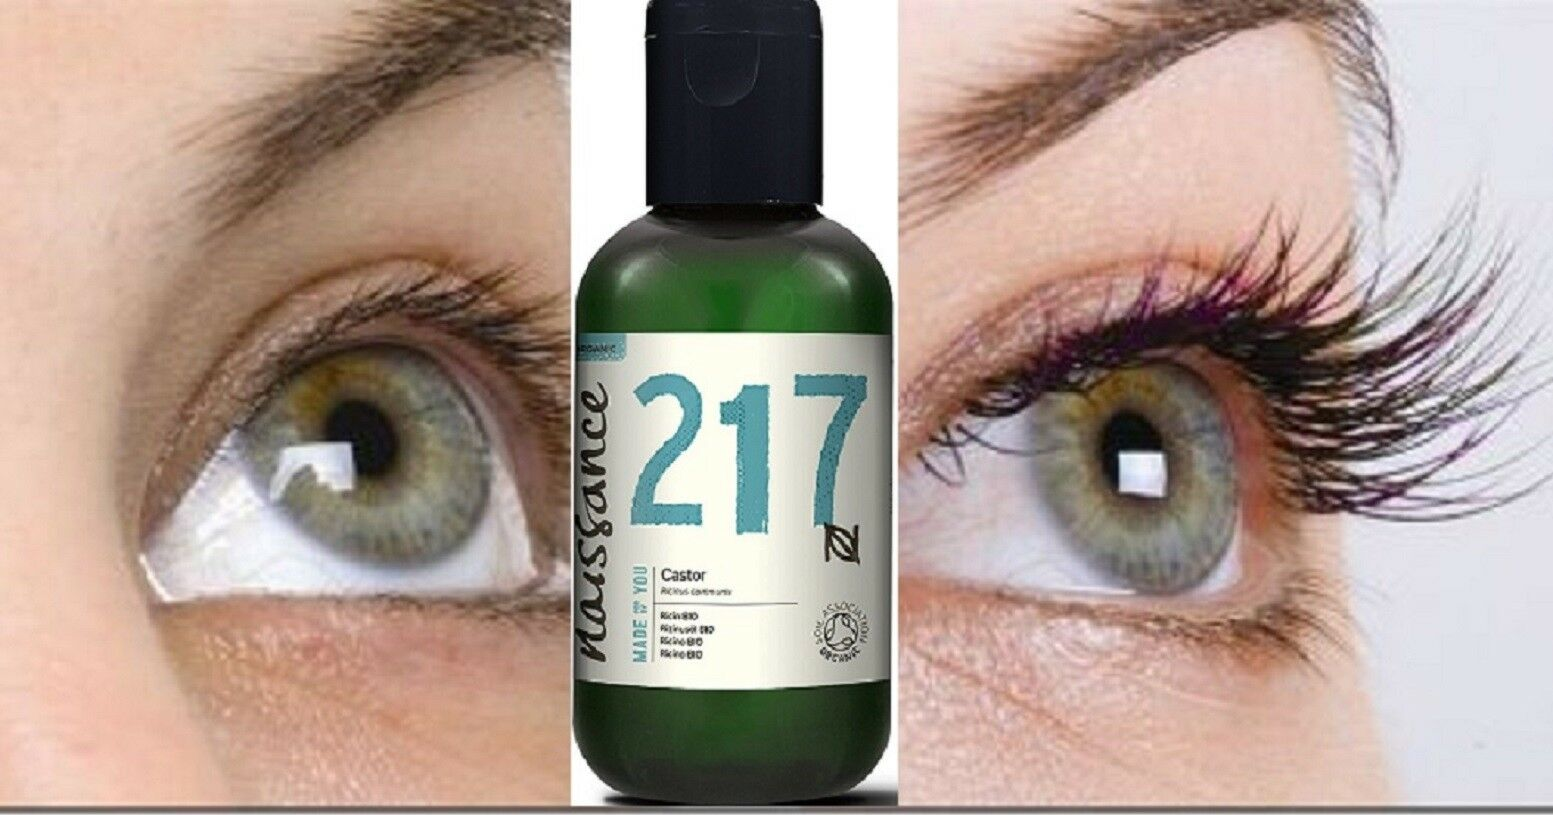 Organic Castor Oil - For Hair, Eyelashes, and Eyebrows Growt